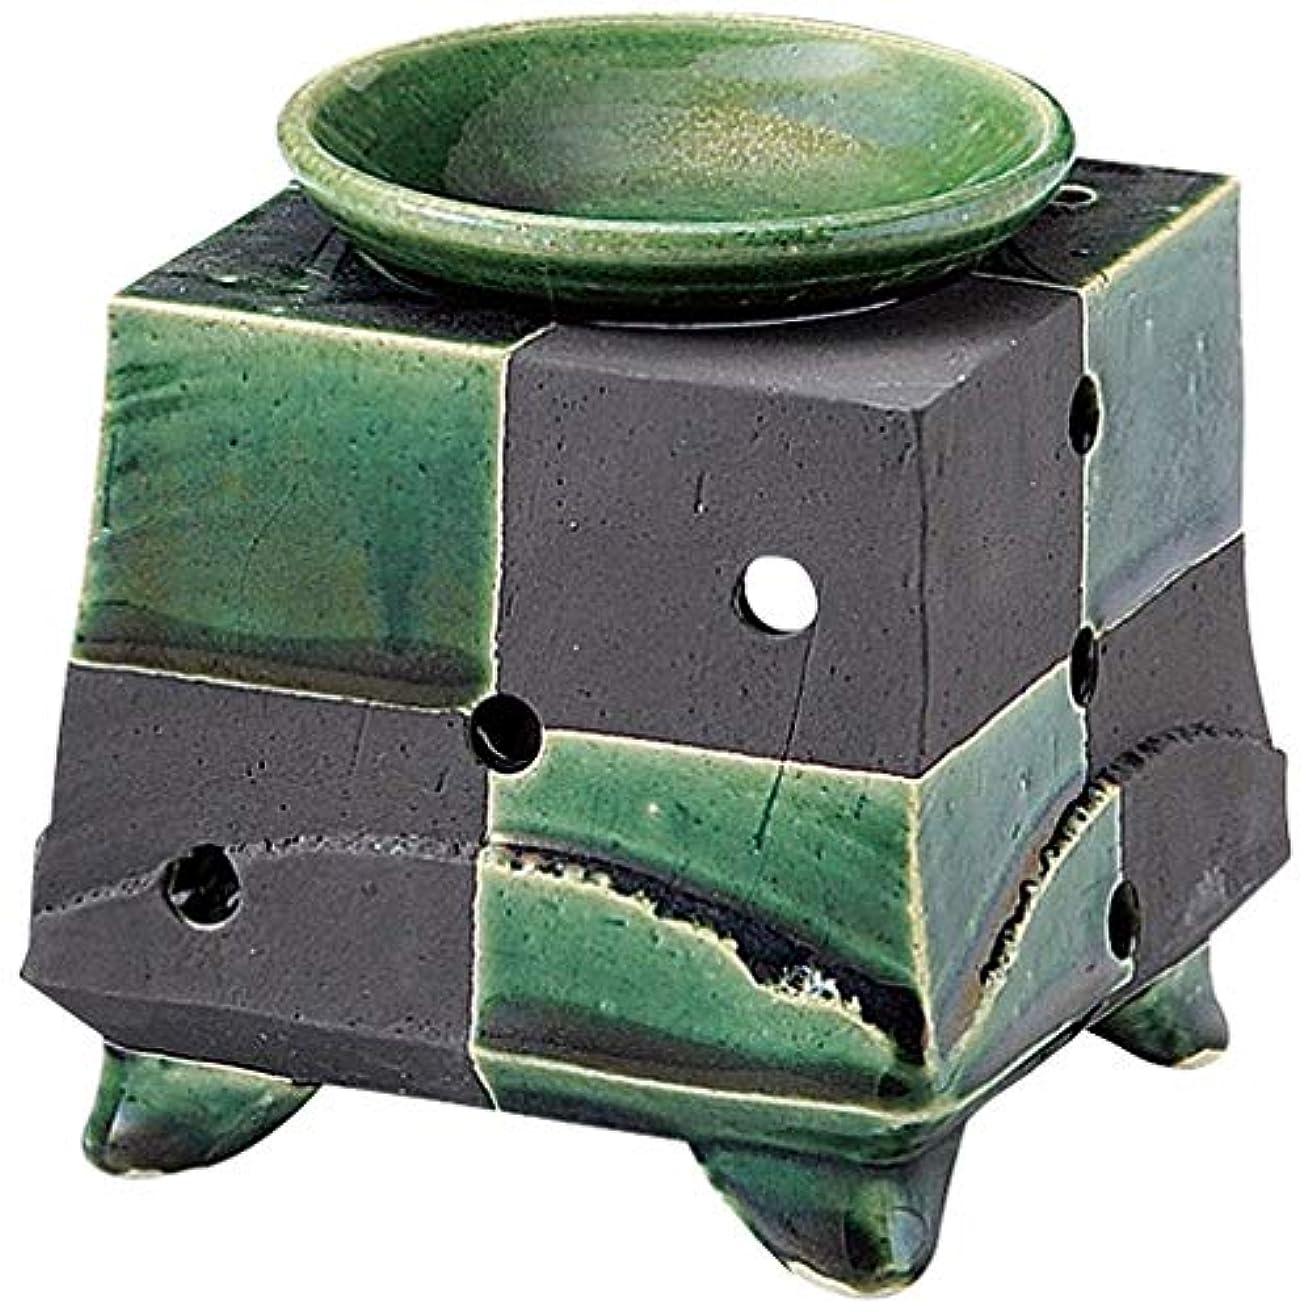 秋制裁育成YI--Y-1622 常滑焼 茶香炉 化粧箱入 径11.5×高さ11.5cm